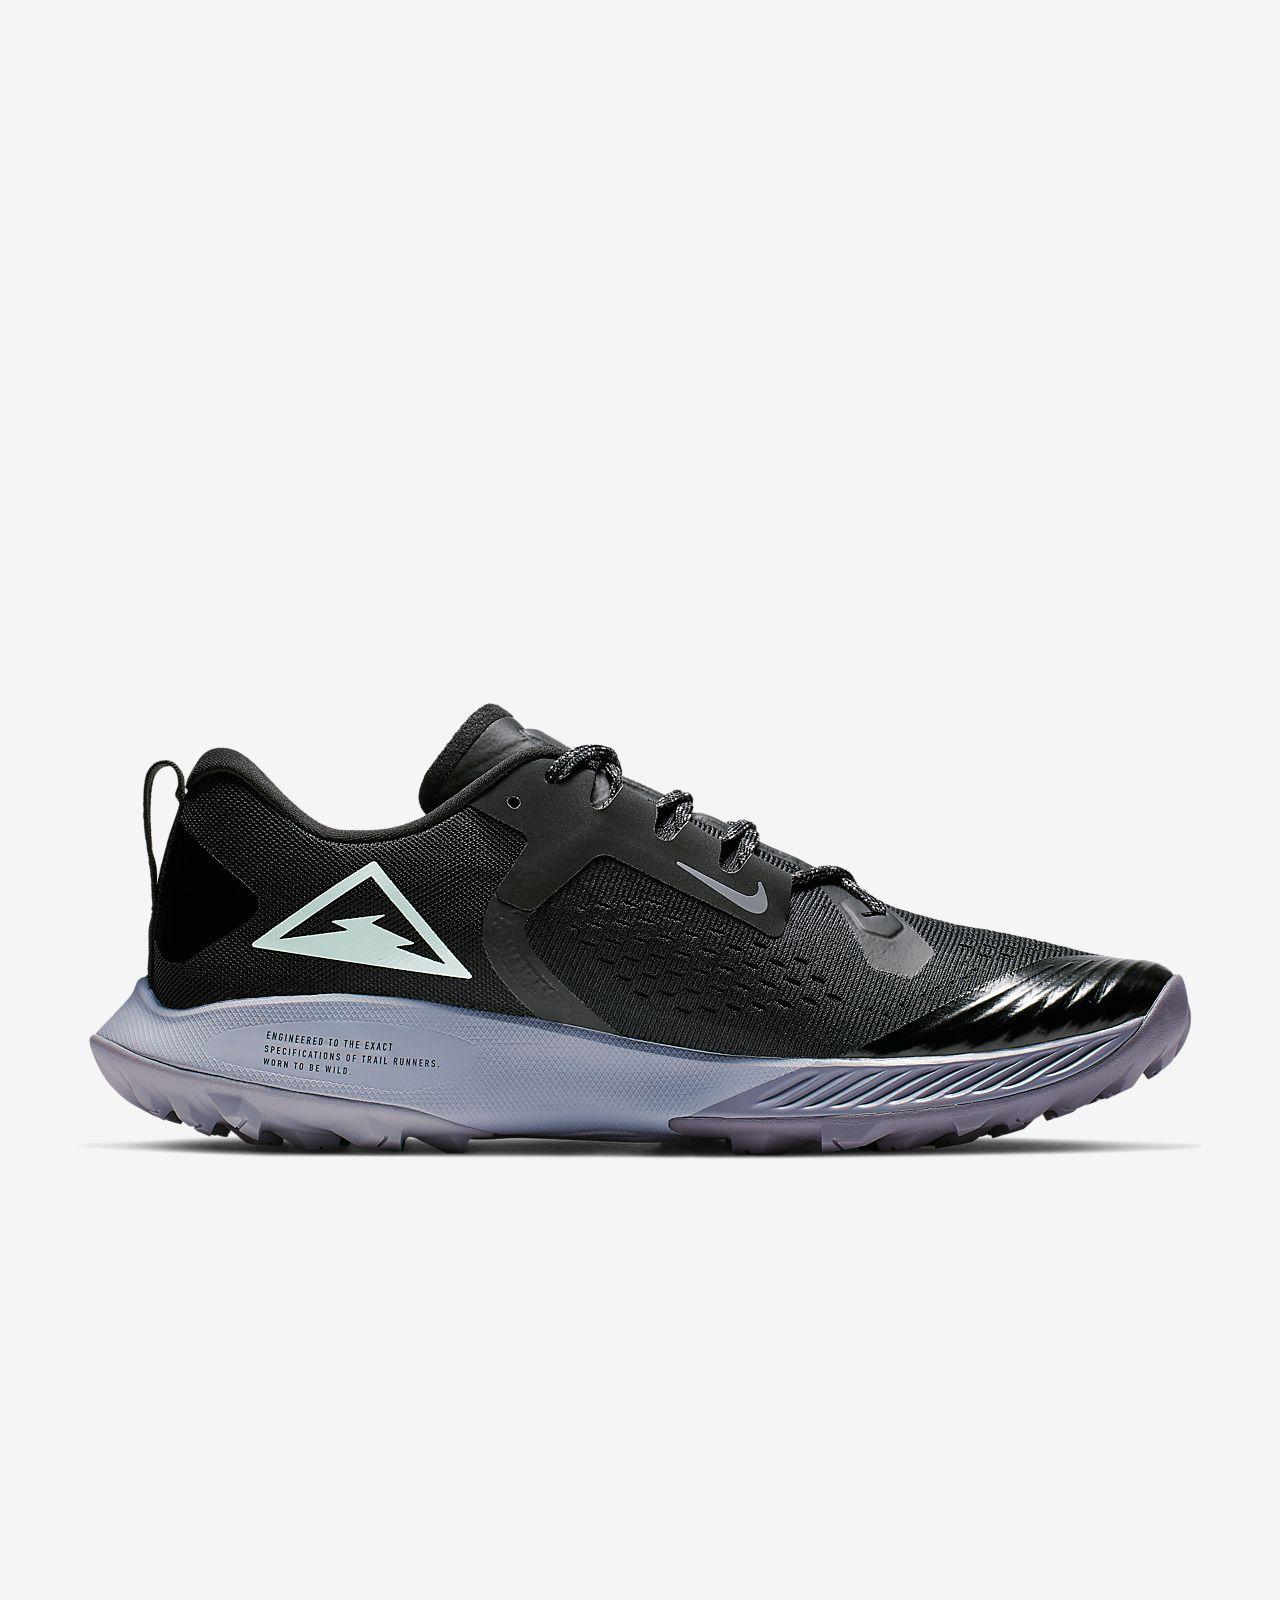 7694cbbf2b68 Nike Air Zoom Terra Kiger 5 Men s Running Shoe. Nike.com ZA